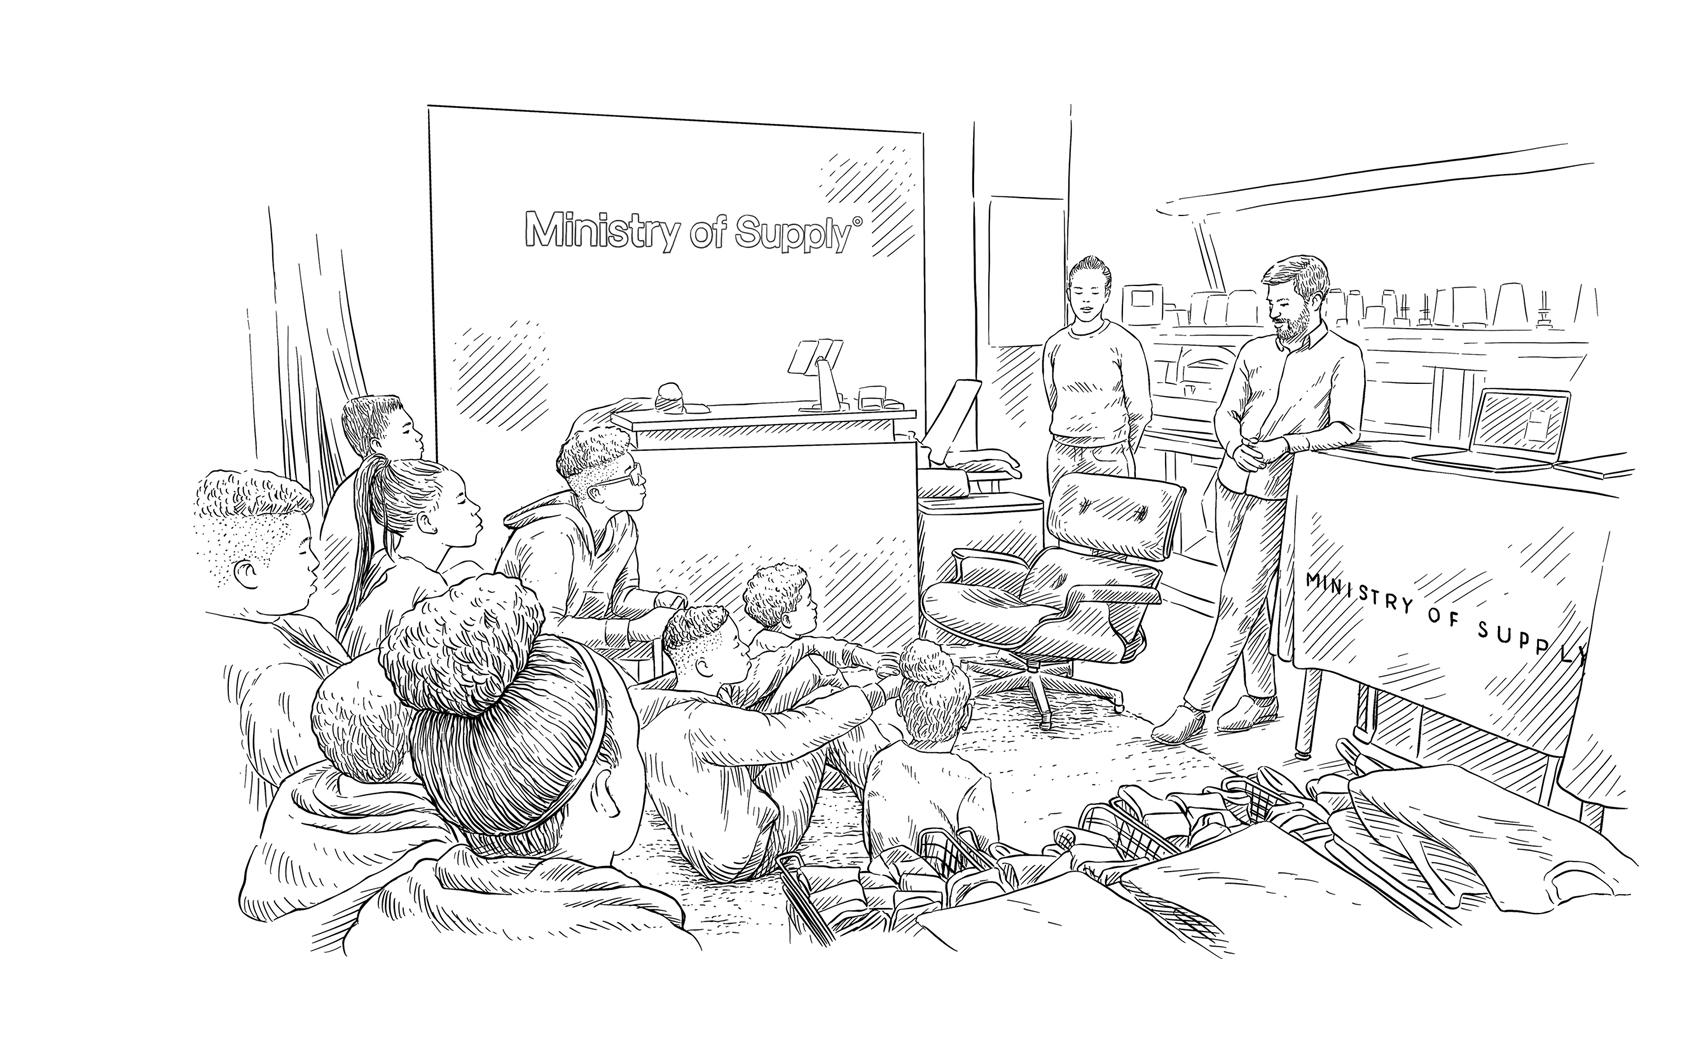 mlabs students at ministry of supply